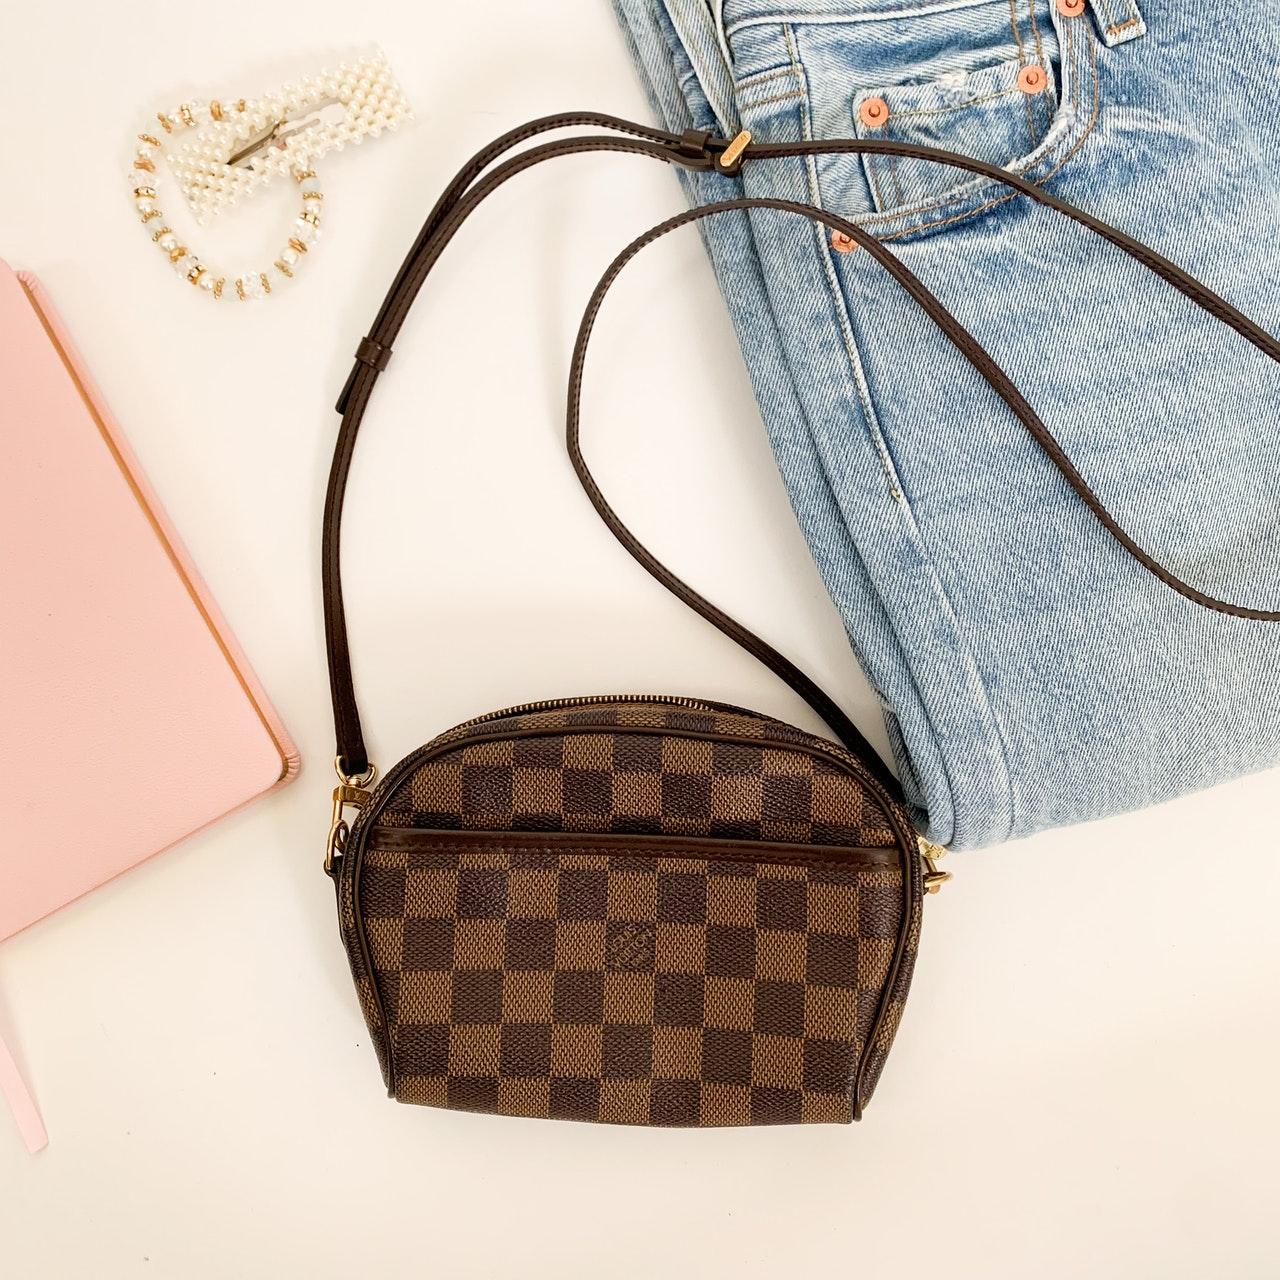 Louis Vuitton bag flat lay